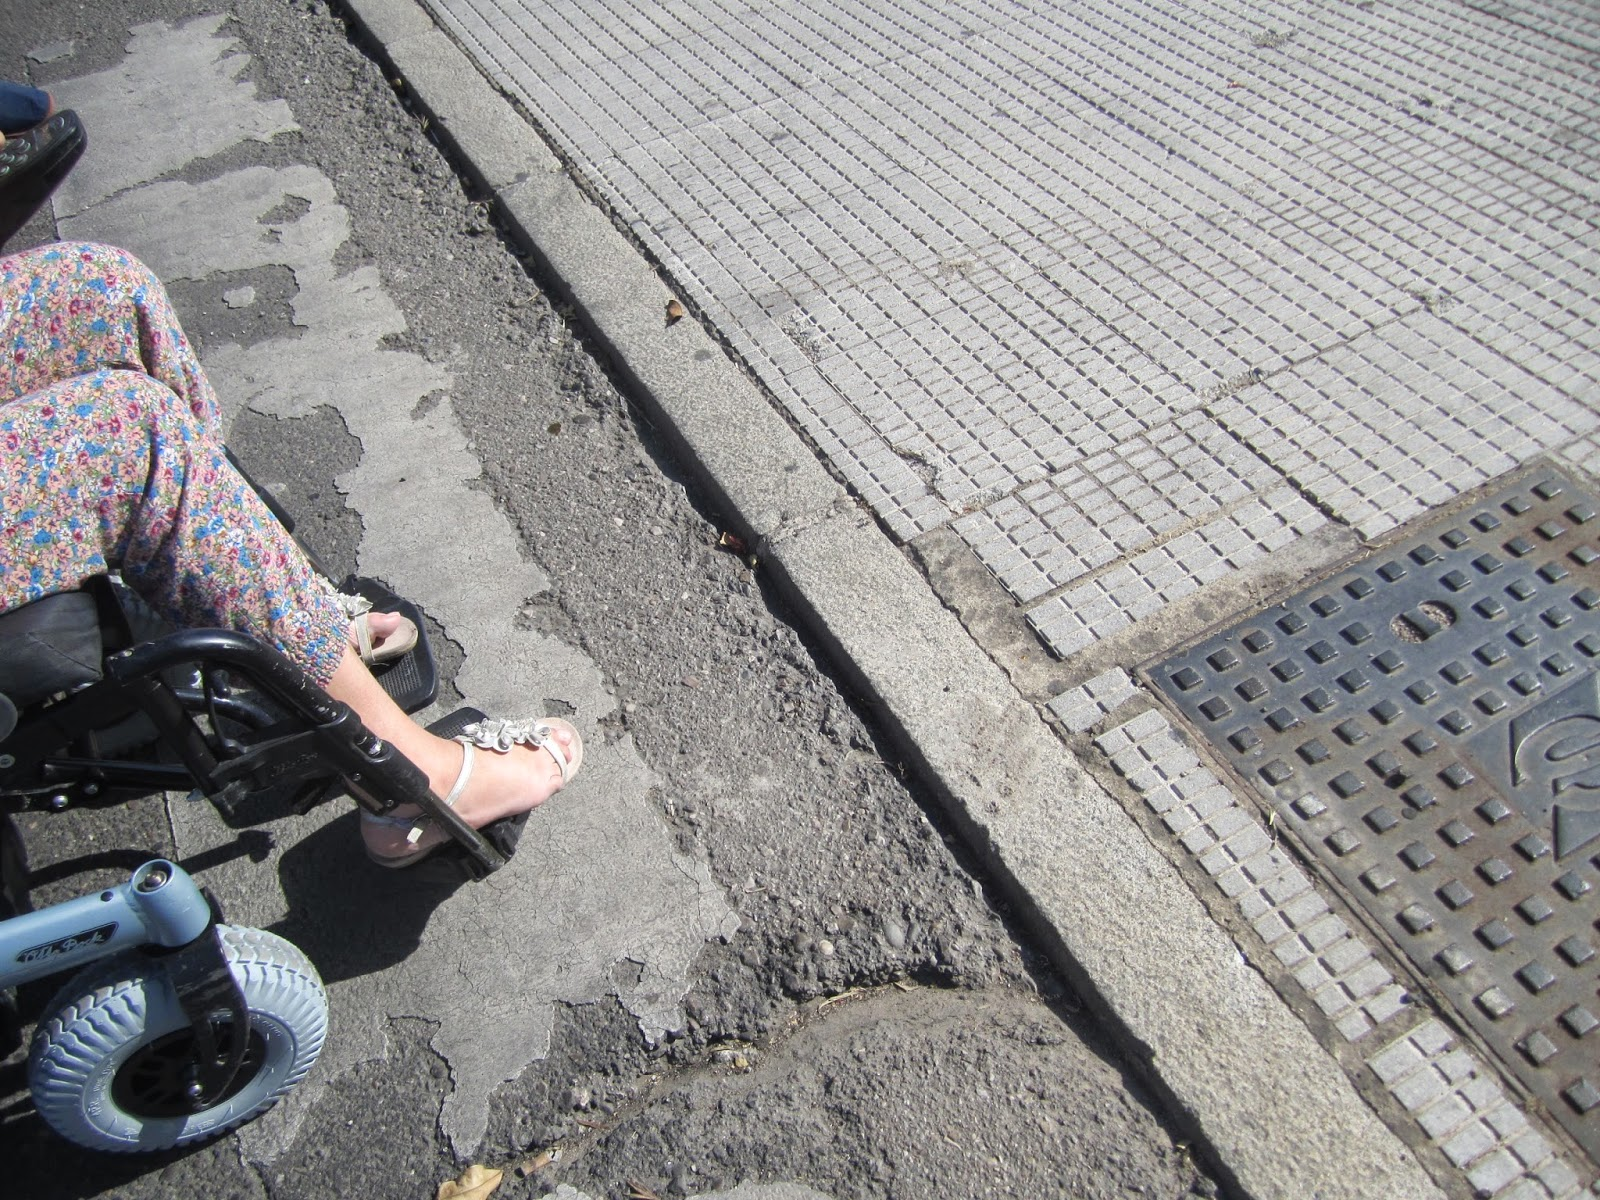 Imagen de persona usuaria de silla de ruedas justo antes de superar el desnivel.